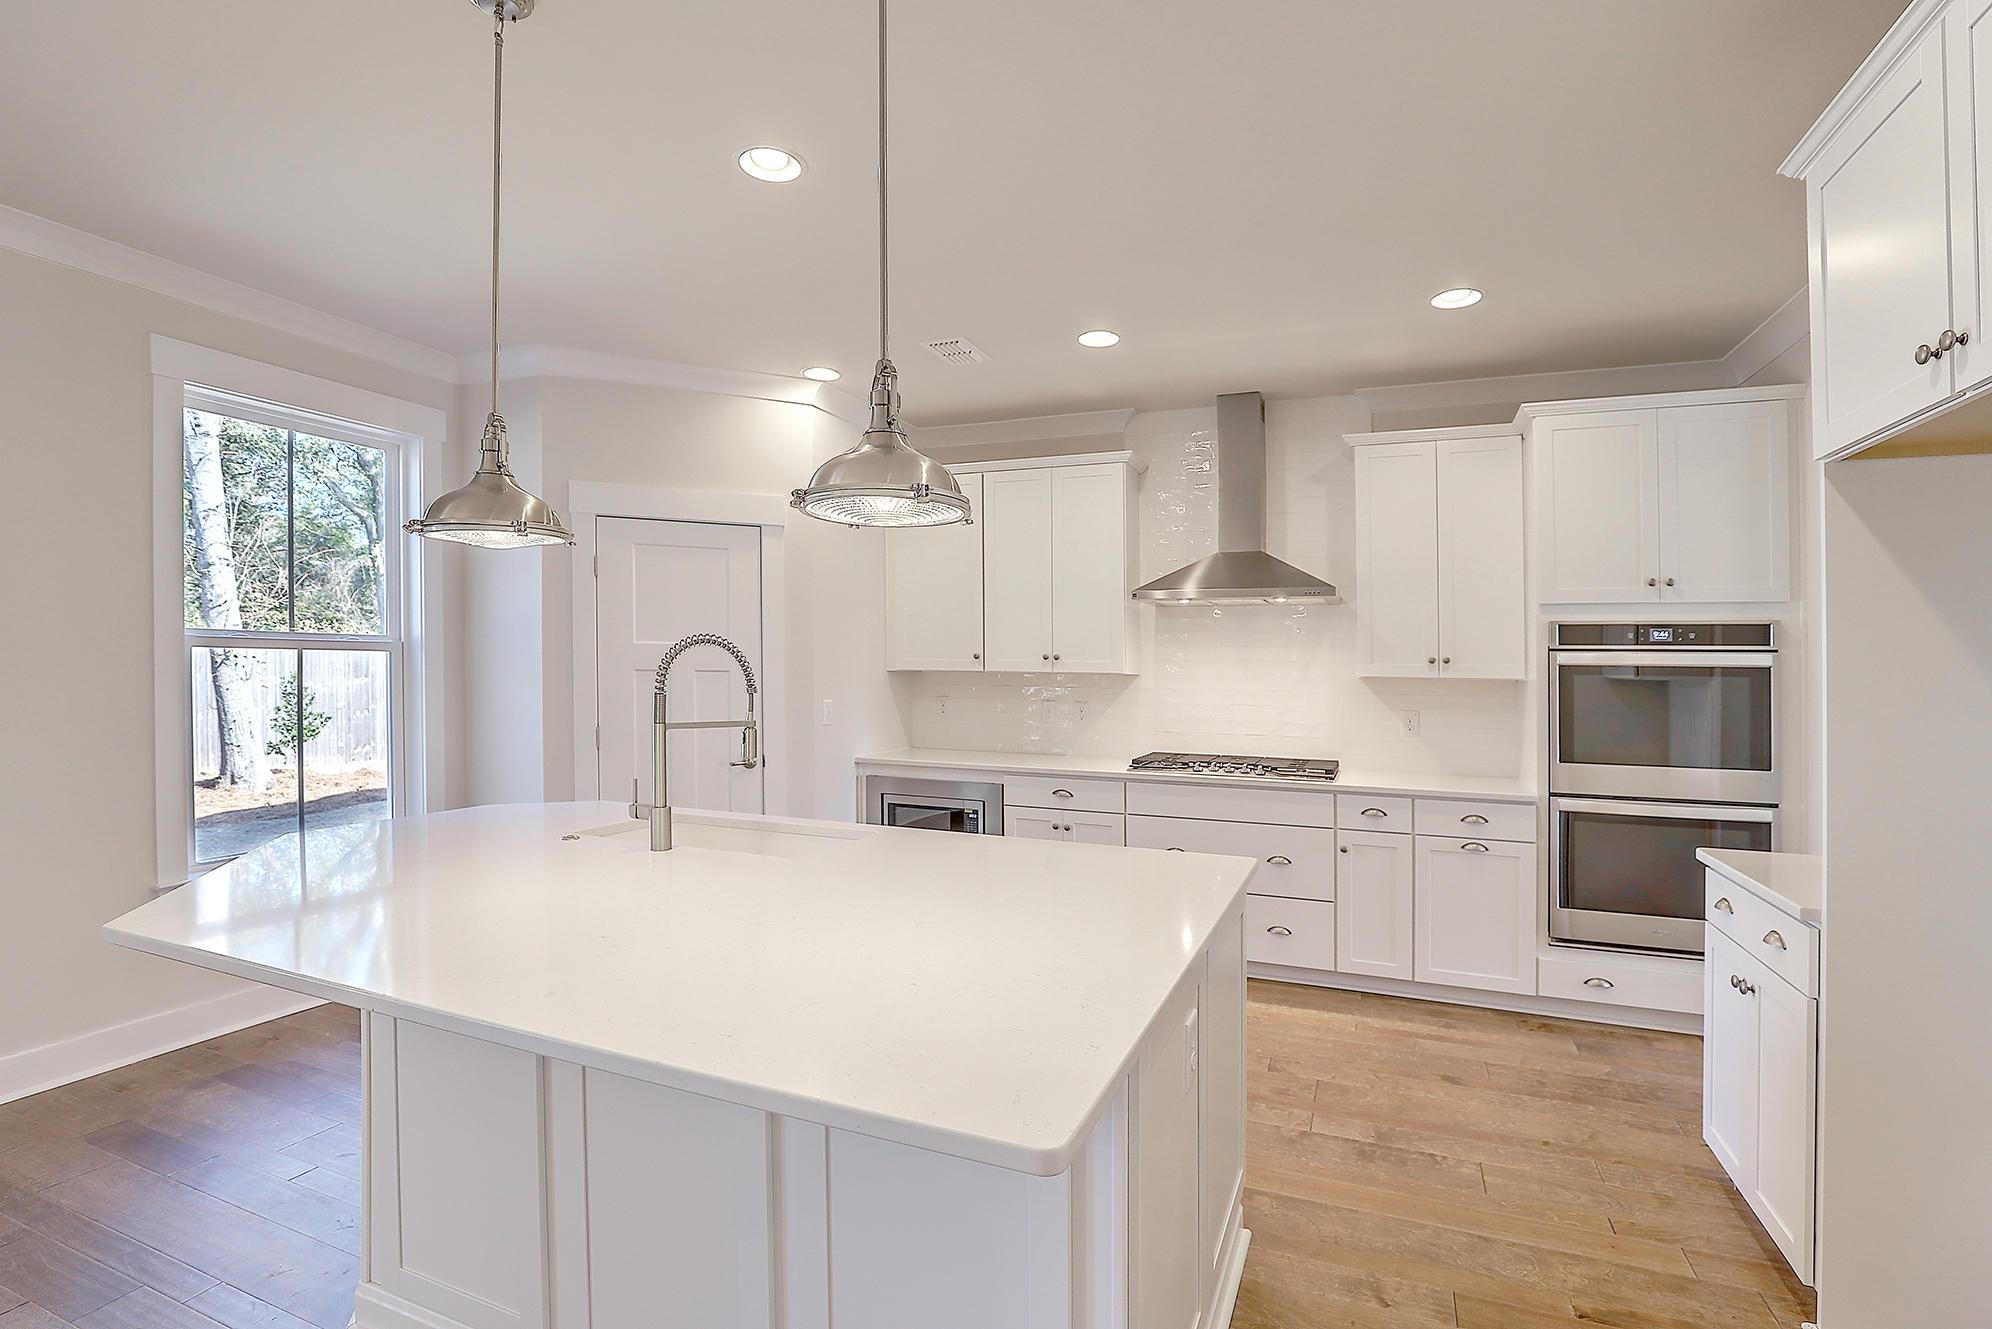 Bentley Park Homes For Sale - 1218 Gannett, Mount Pleasant, SC - 23